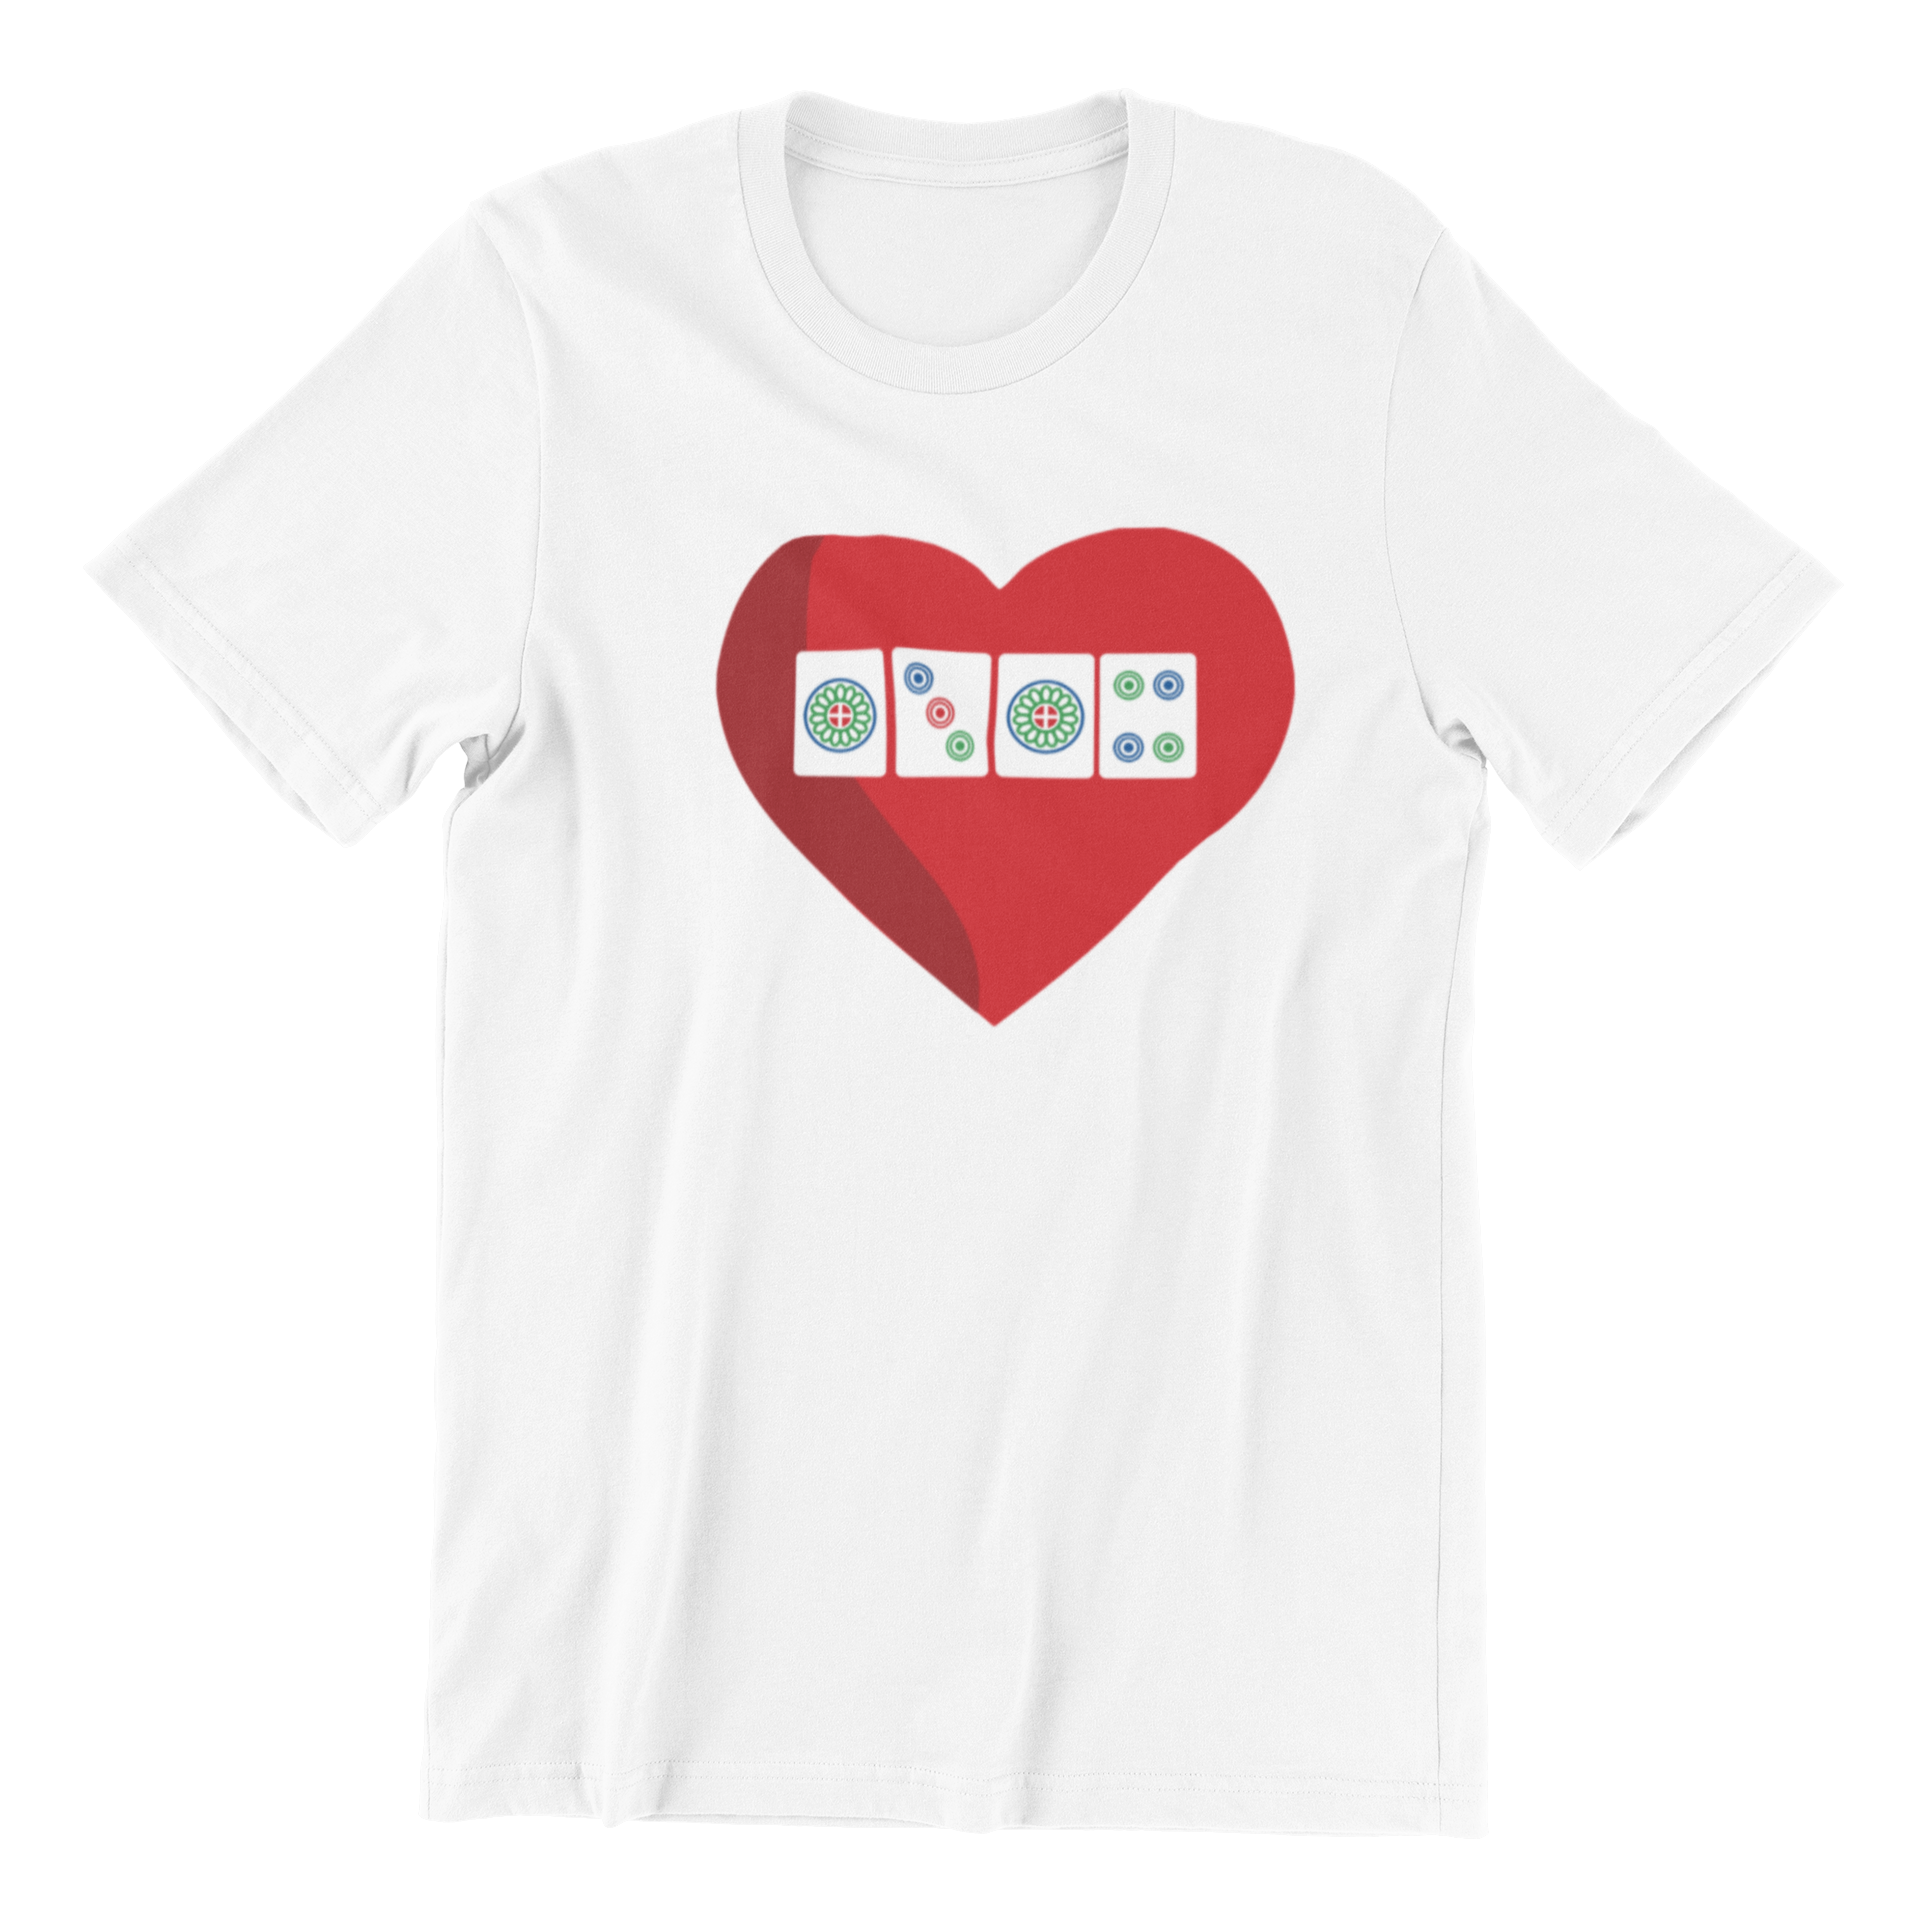 Love 1314 Crew Neck S-Sleeve T-shirt